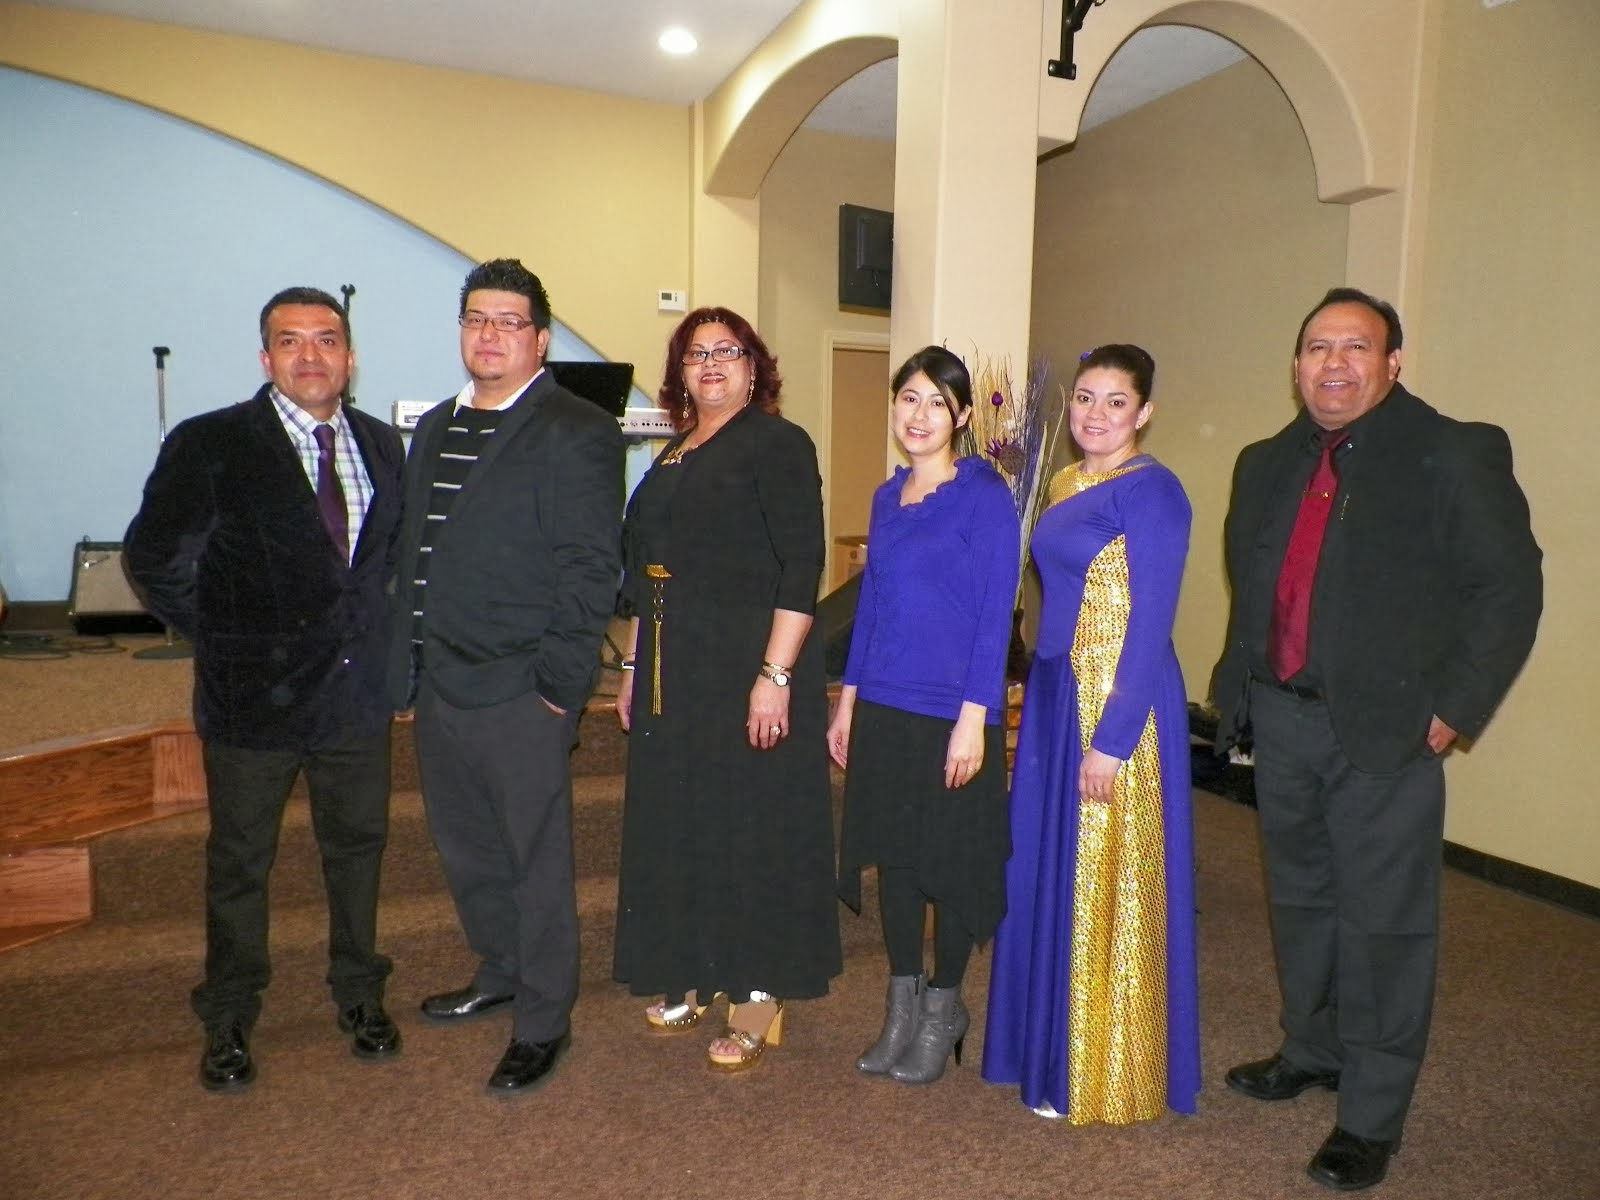 Maestros De Escuela Dominical